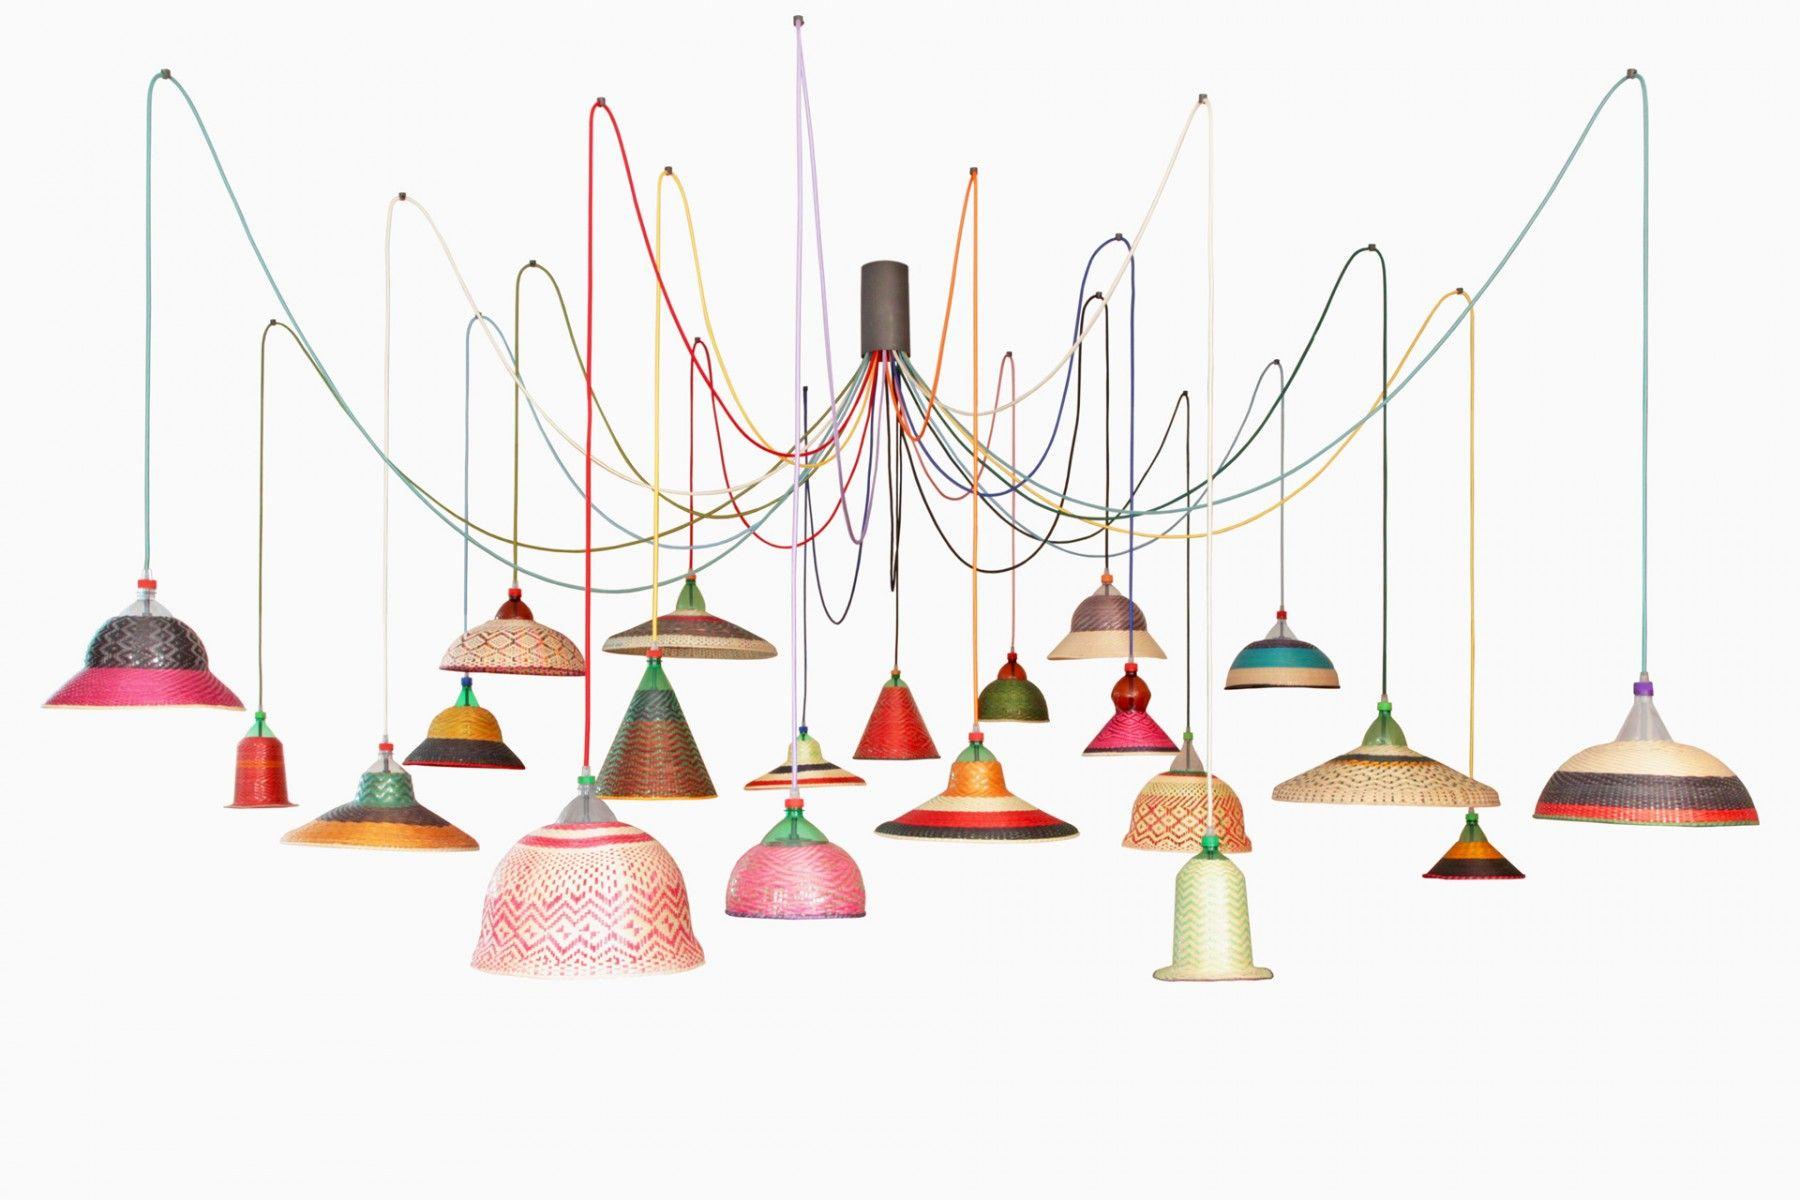 A collaboration between Madrid-based designer Alvaro Catalán de Ocón and a group…